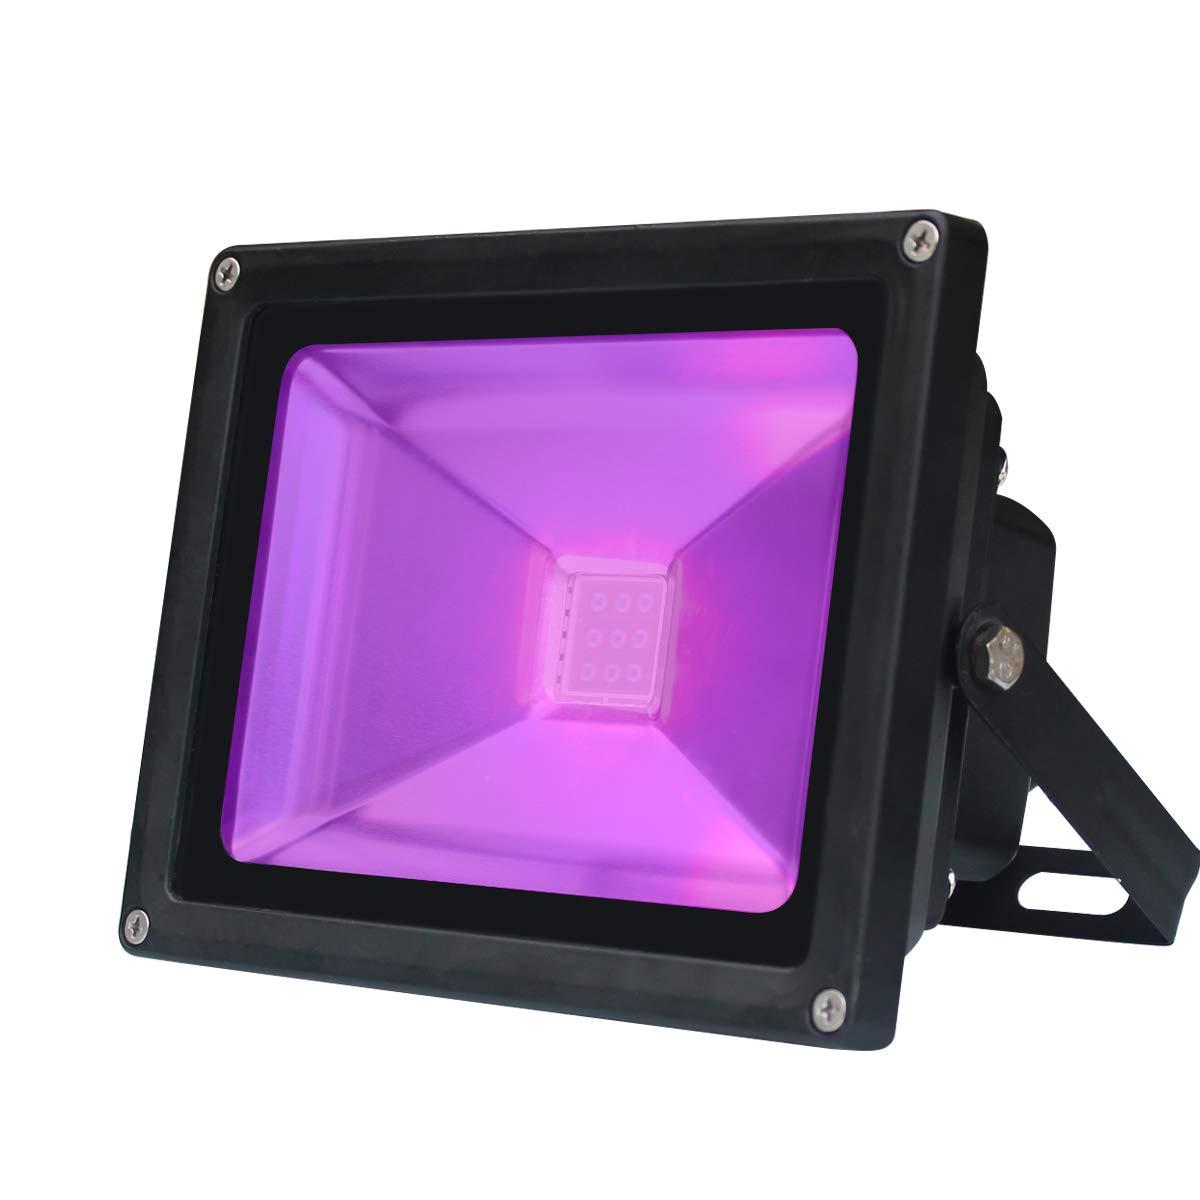 UV LED Black Light, 10W Violet LED Stage Decorative Light, AC 85-265V Energy-Saving LED Flood Waterproof Aluminum+Glass Ultra Lamp for Indoor Outdoor Entertainment Holiday Fluorescent Celebration